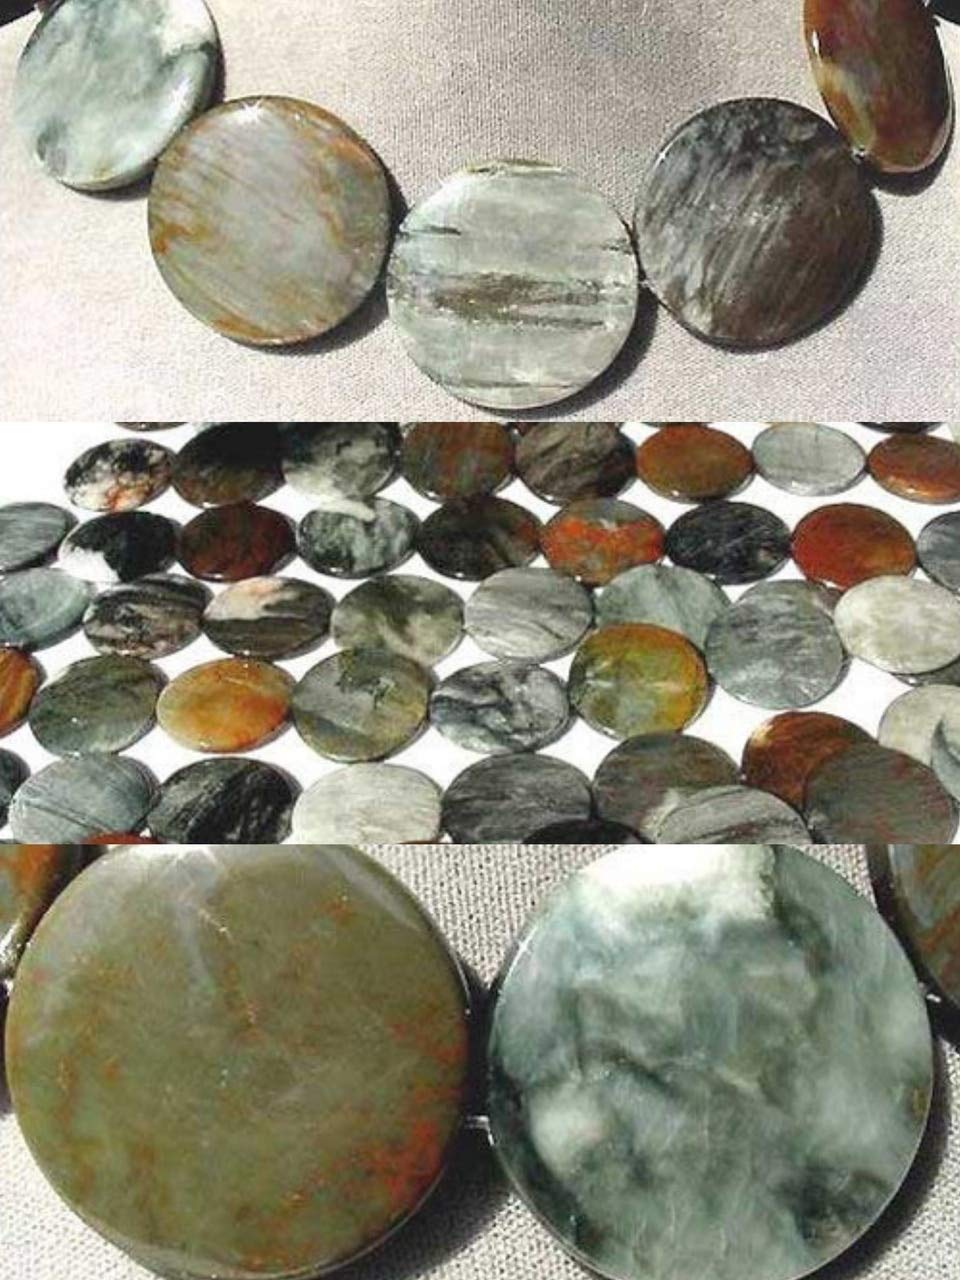 Cat's Eye Chrysoberyl Quartz Flat 35x5mm Disc Bead Strand for Jewelry Making 105615 by Generic